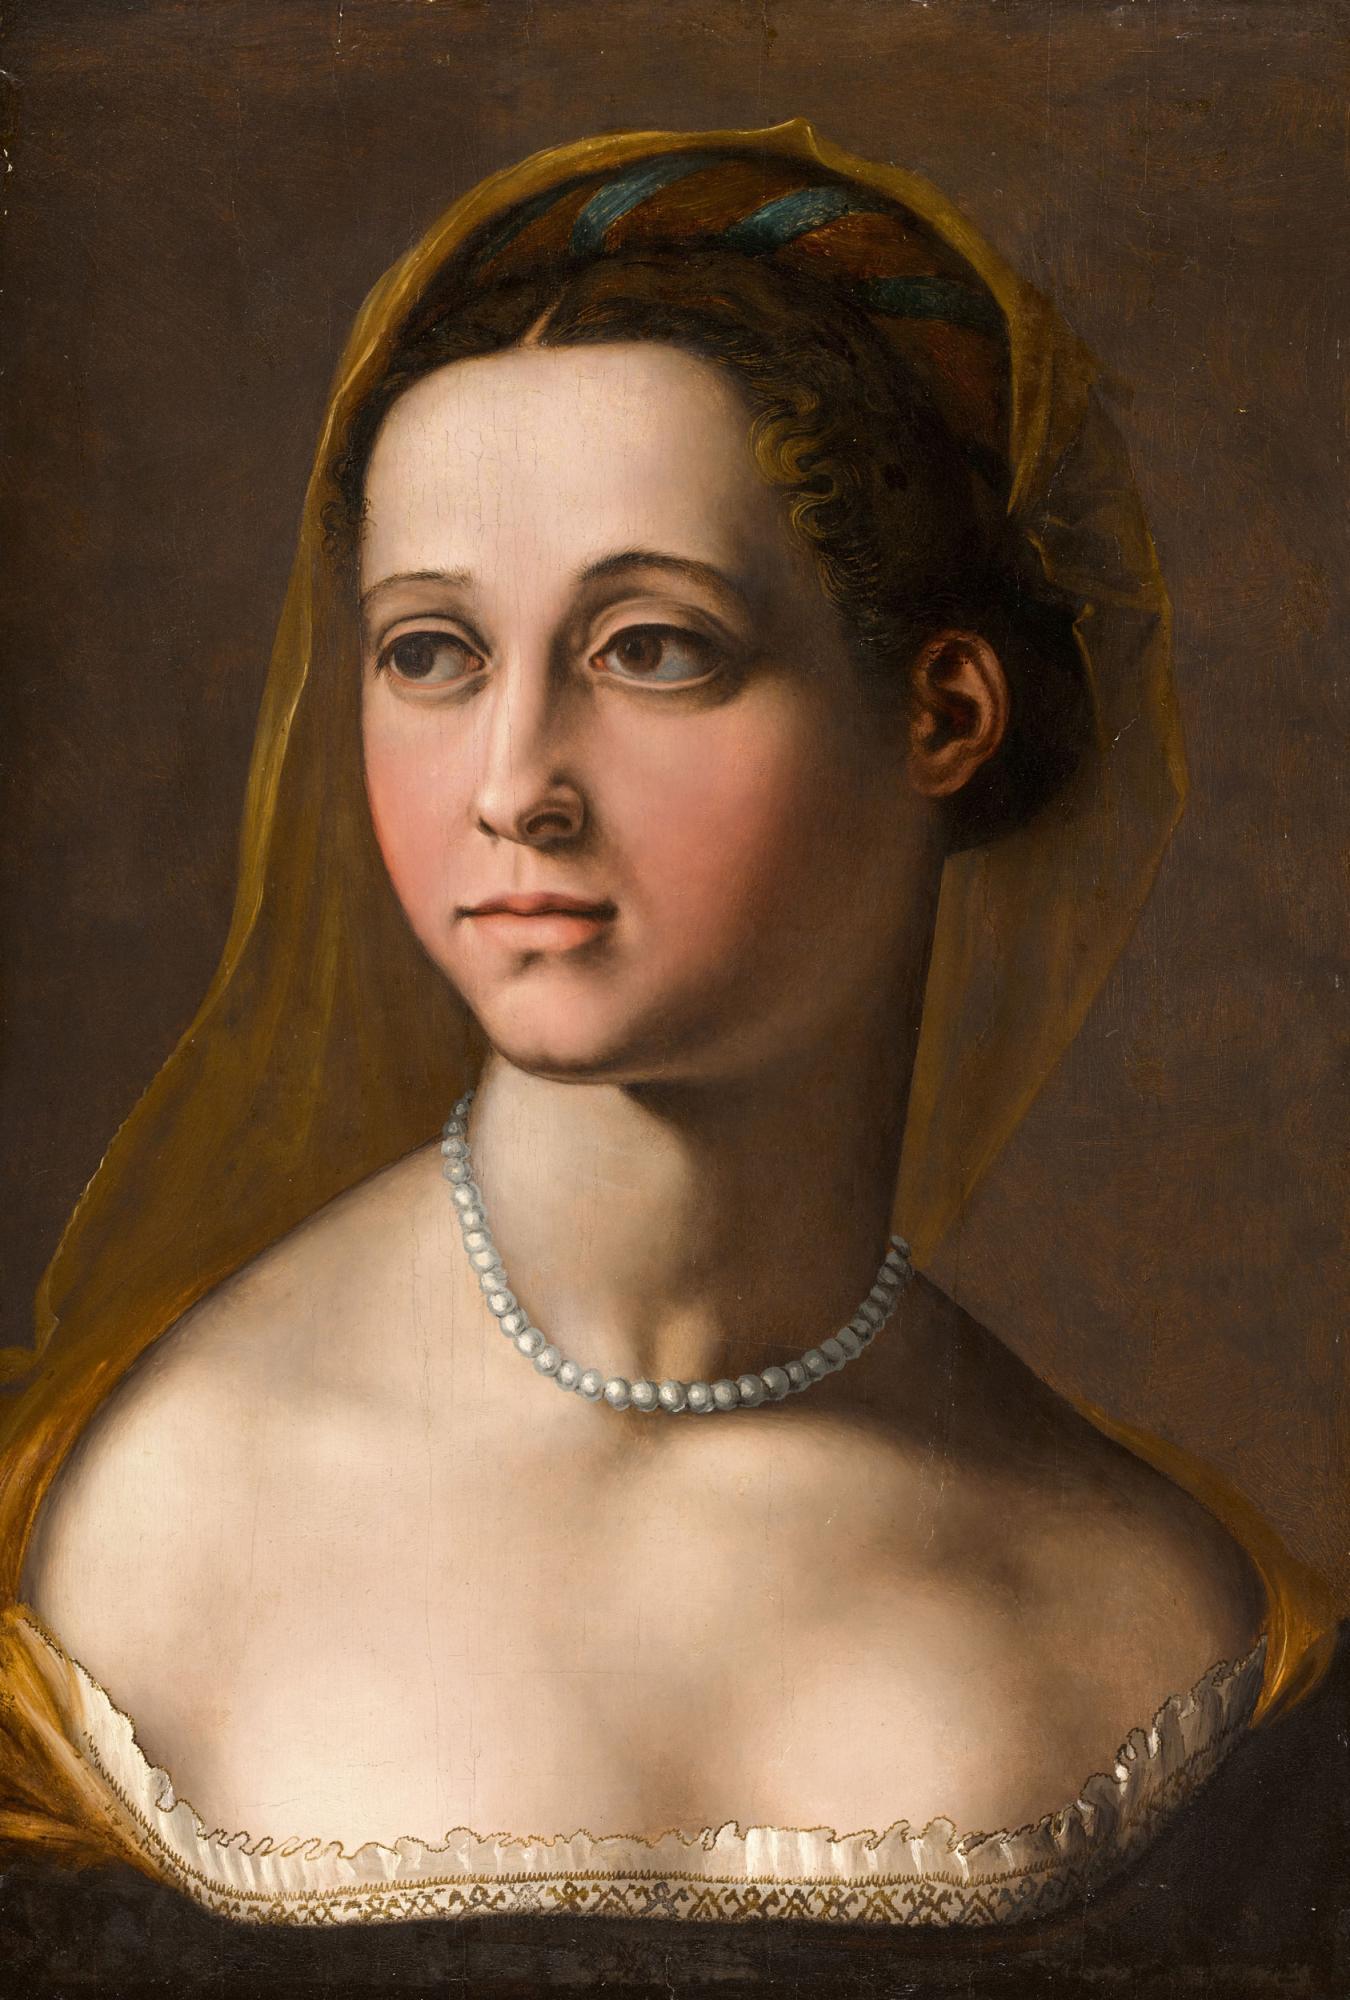 Lot-121,-Giulio-Romano,-Portrait-of-a-woman,-head-and-shoulders,-est.jpg